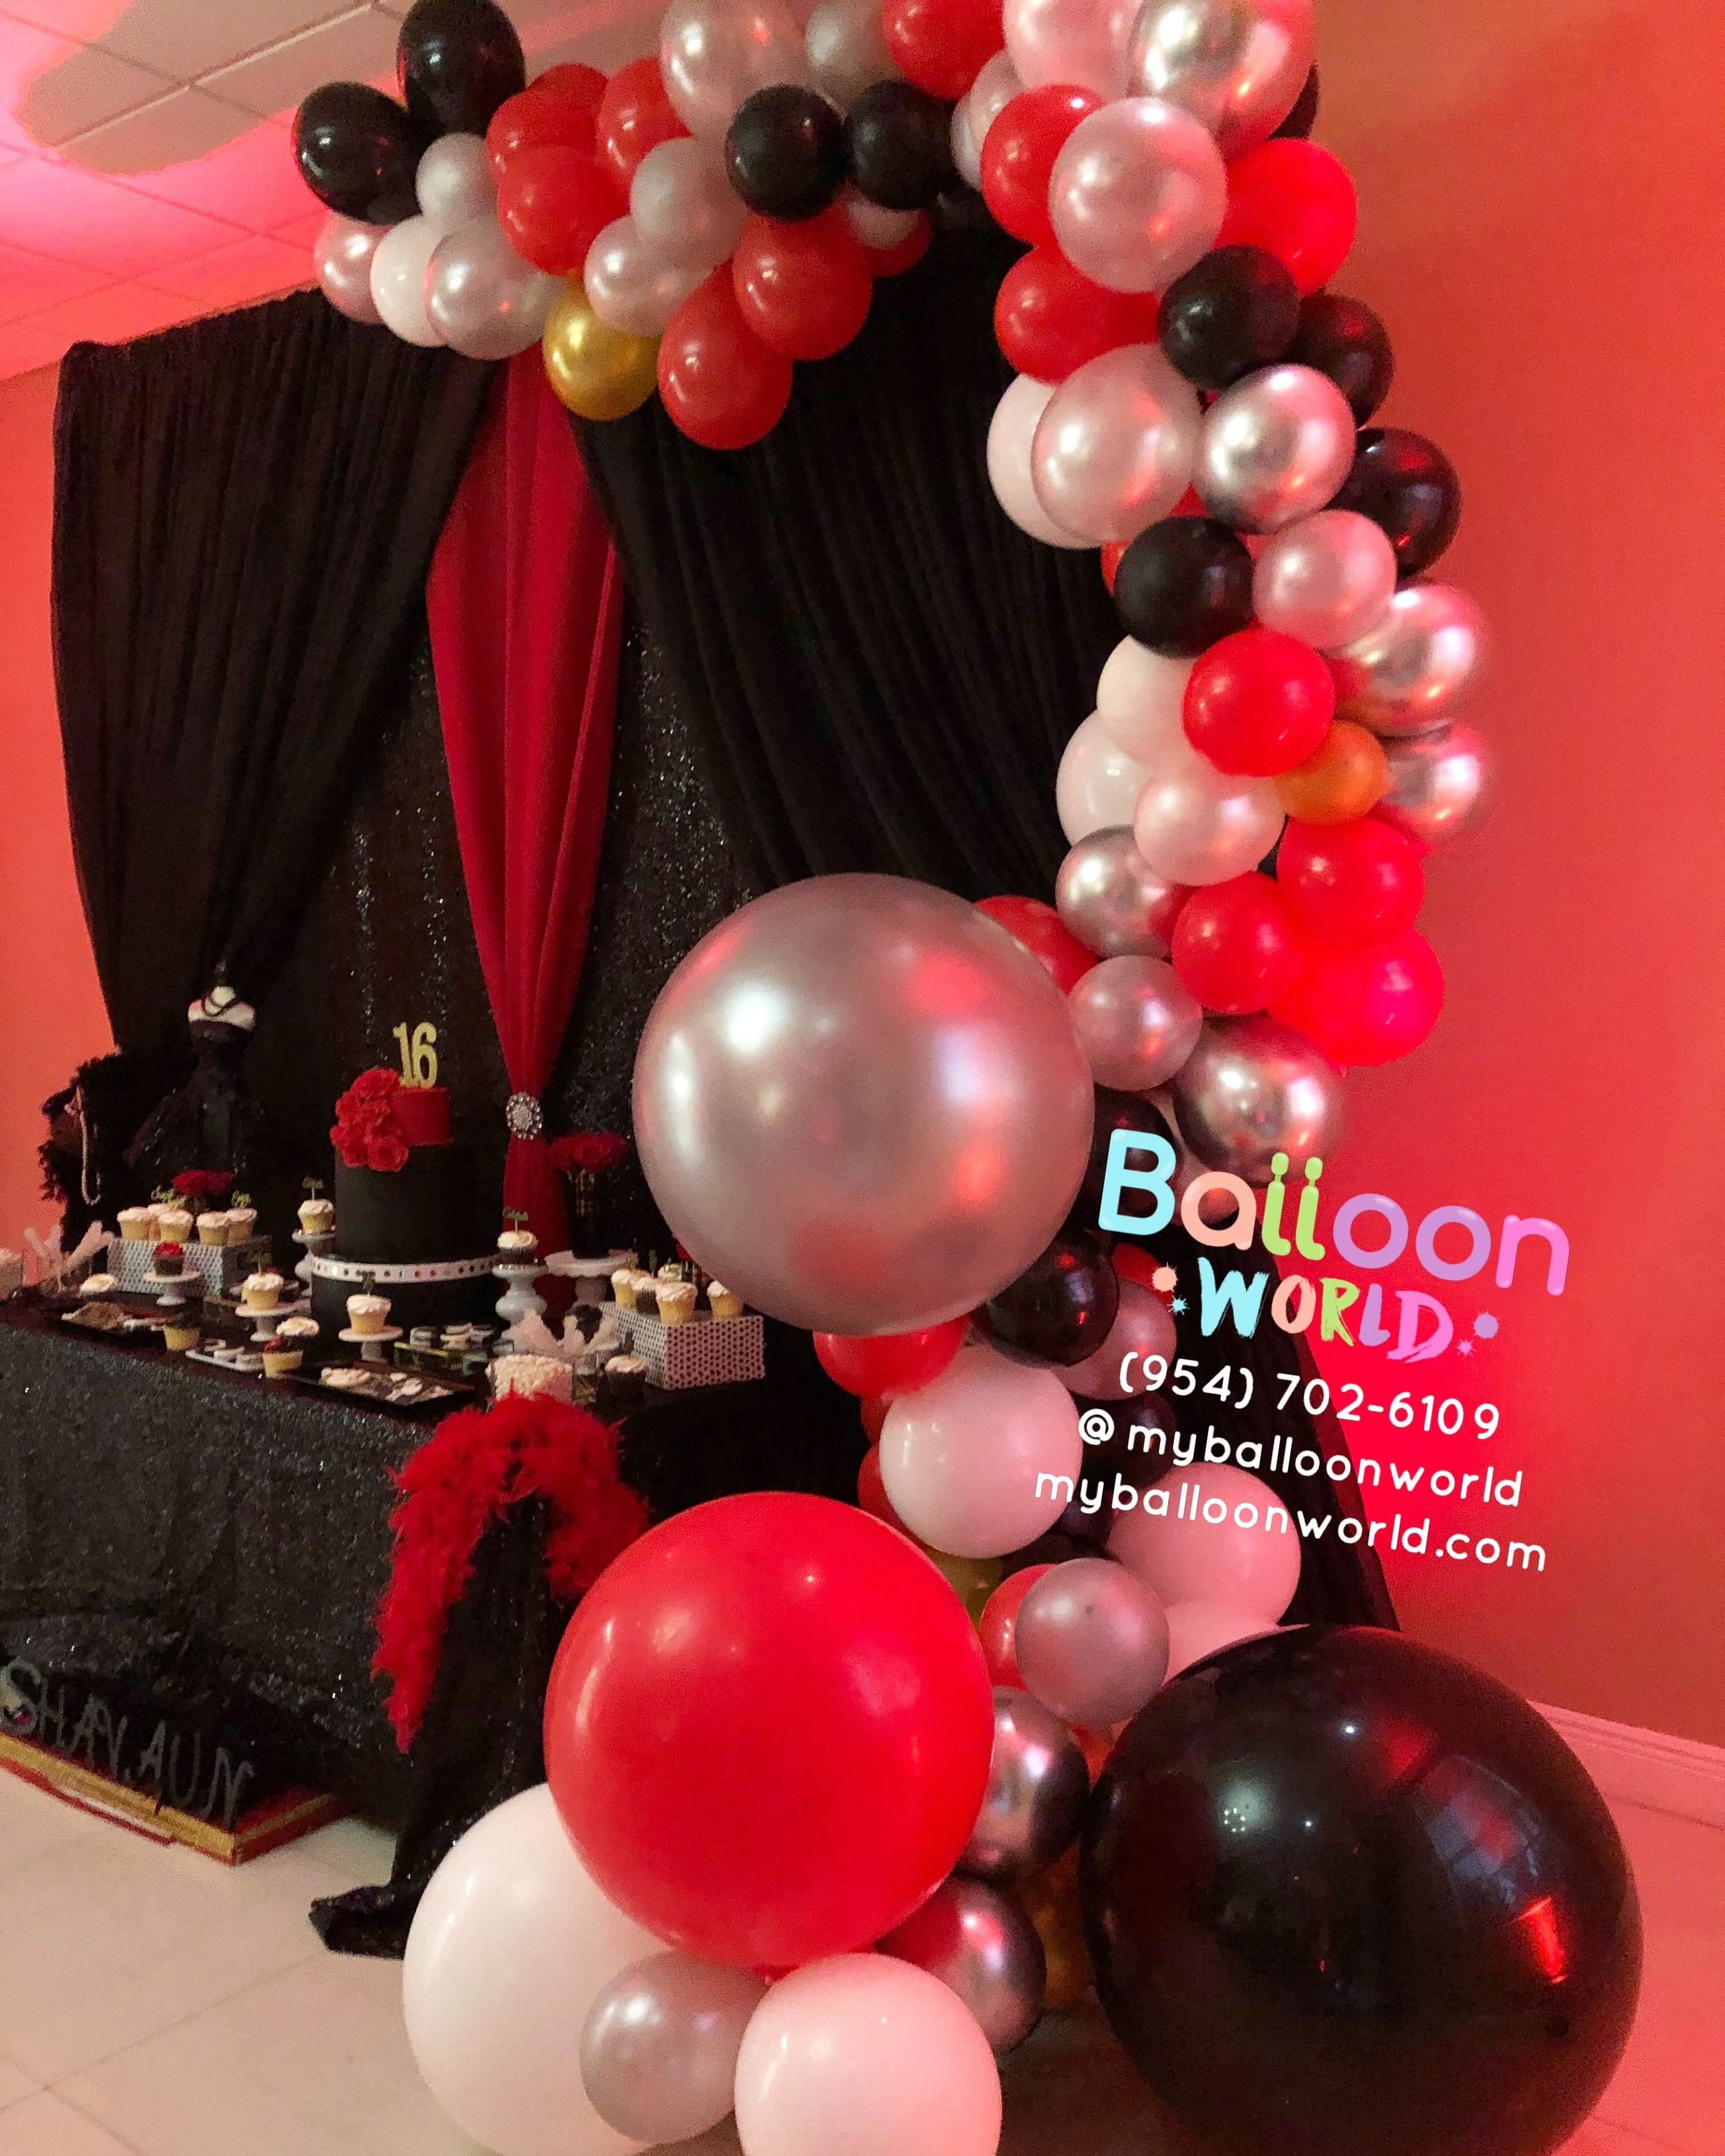 Red And Silver Balloon Garland Balloon Garland Elegant Balloon Decoration Balloondesigns Balloontwist Balloon Ballon Garland Baloon Garland Balloon Garland